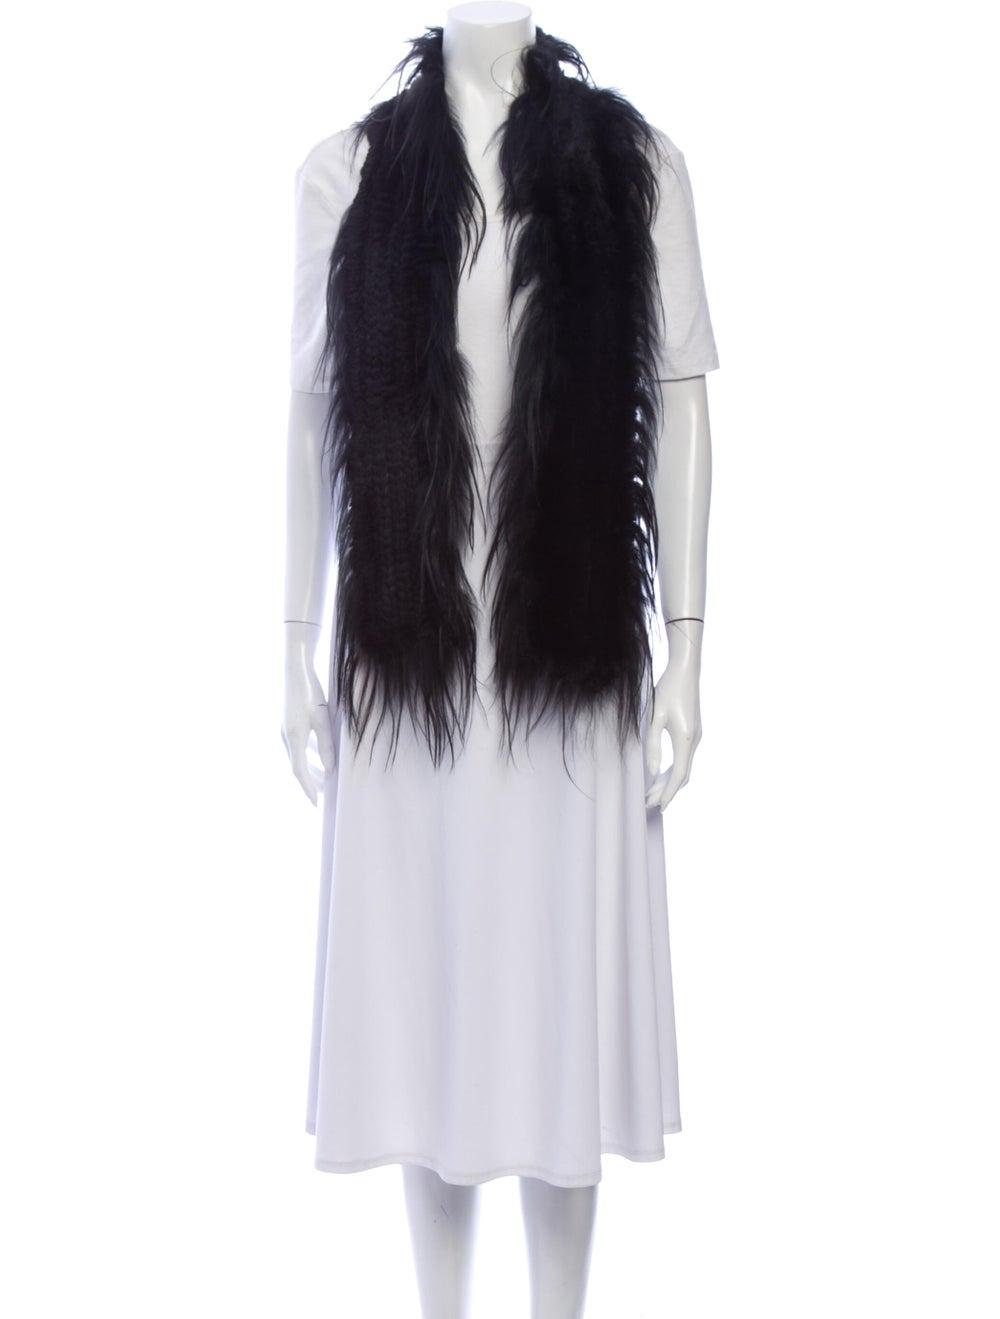 Fur Fur Stole Black - image 3